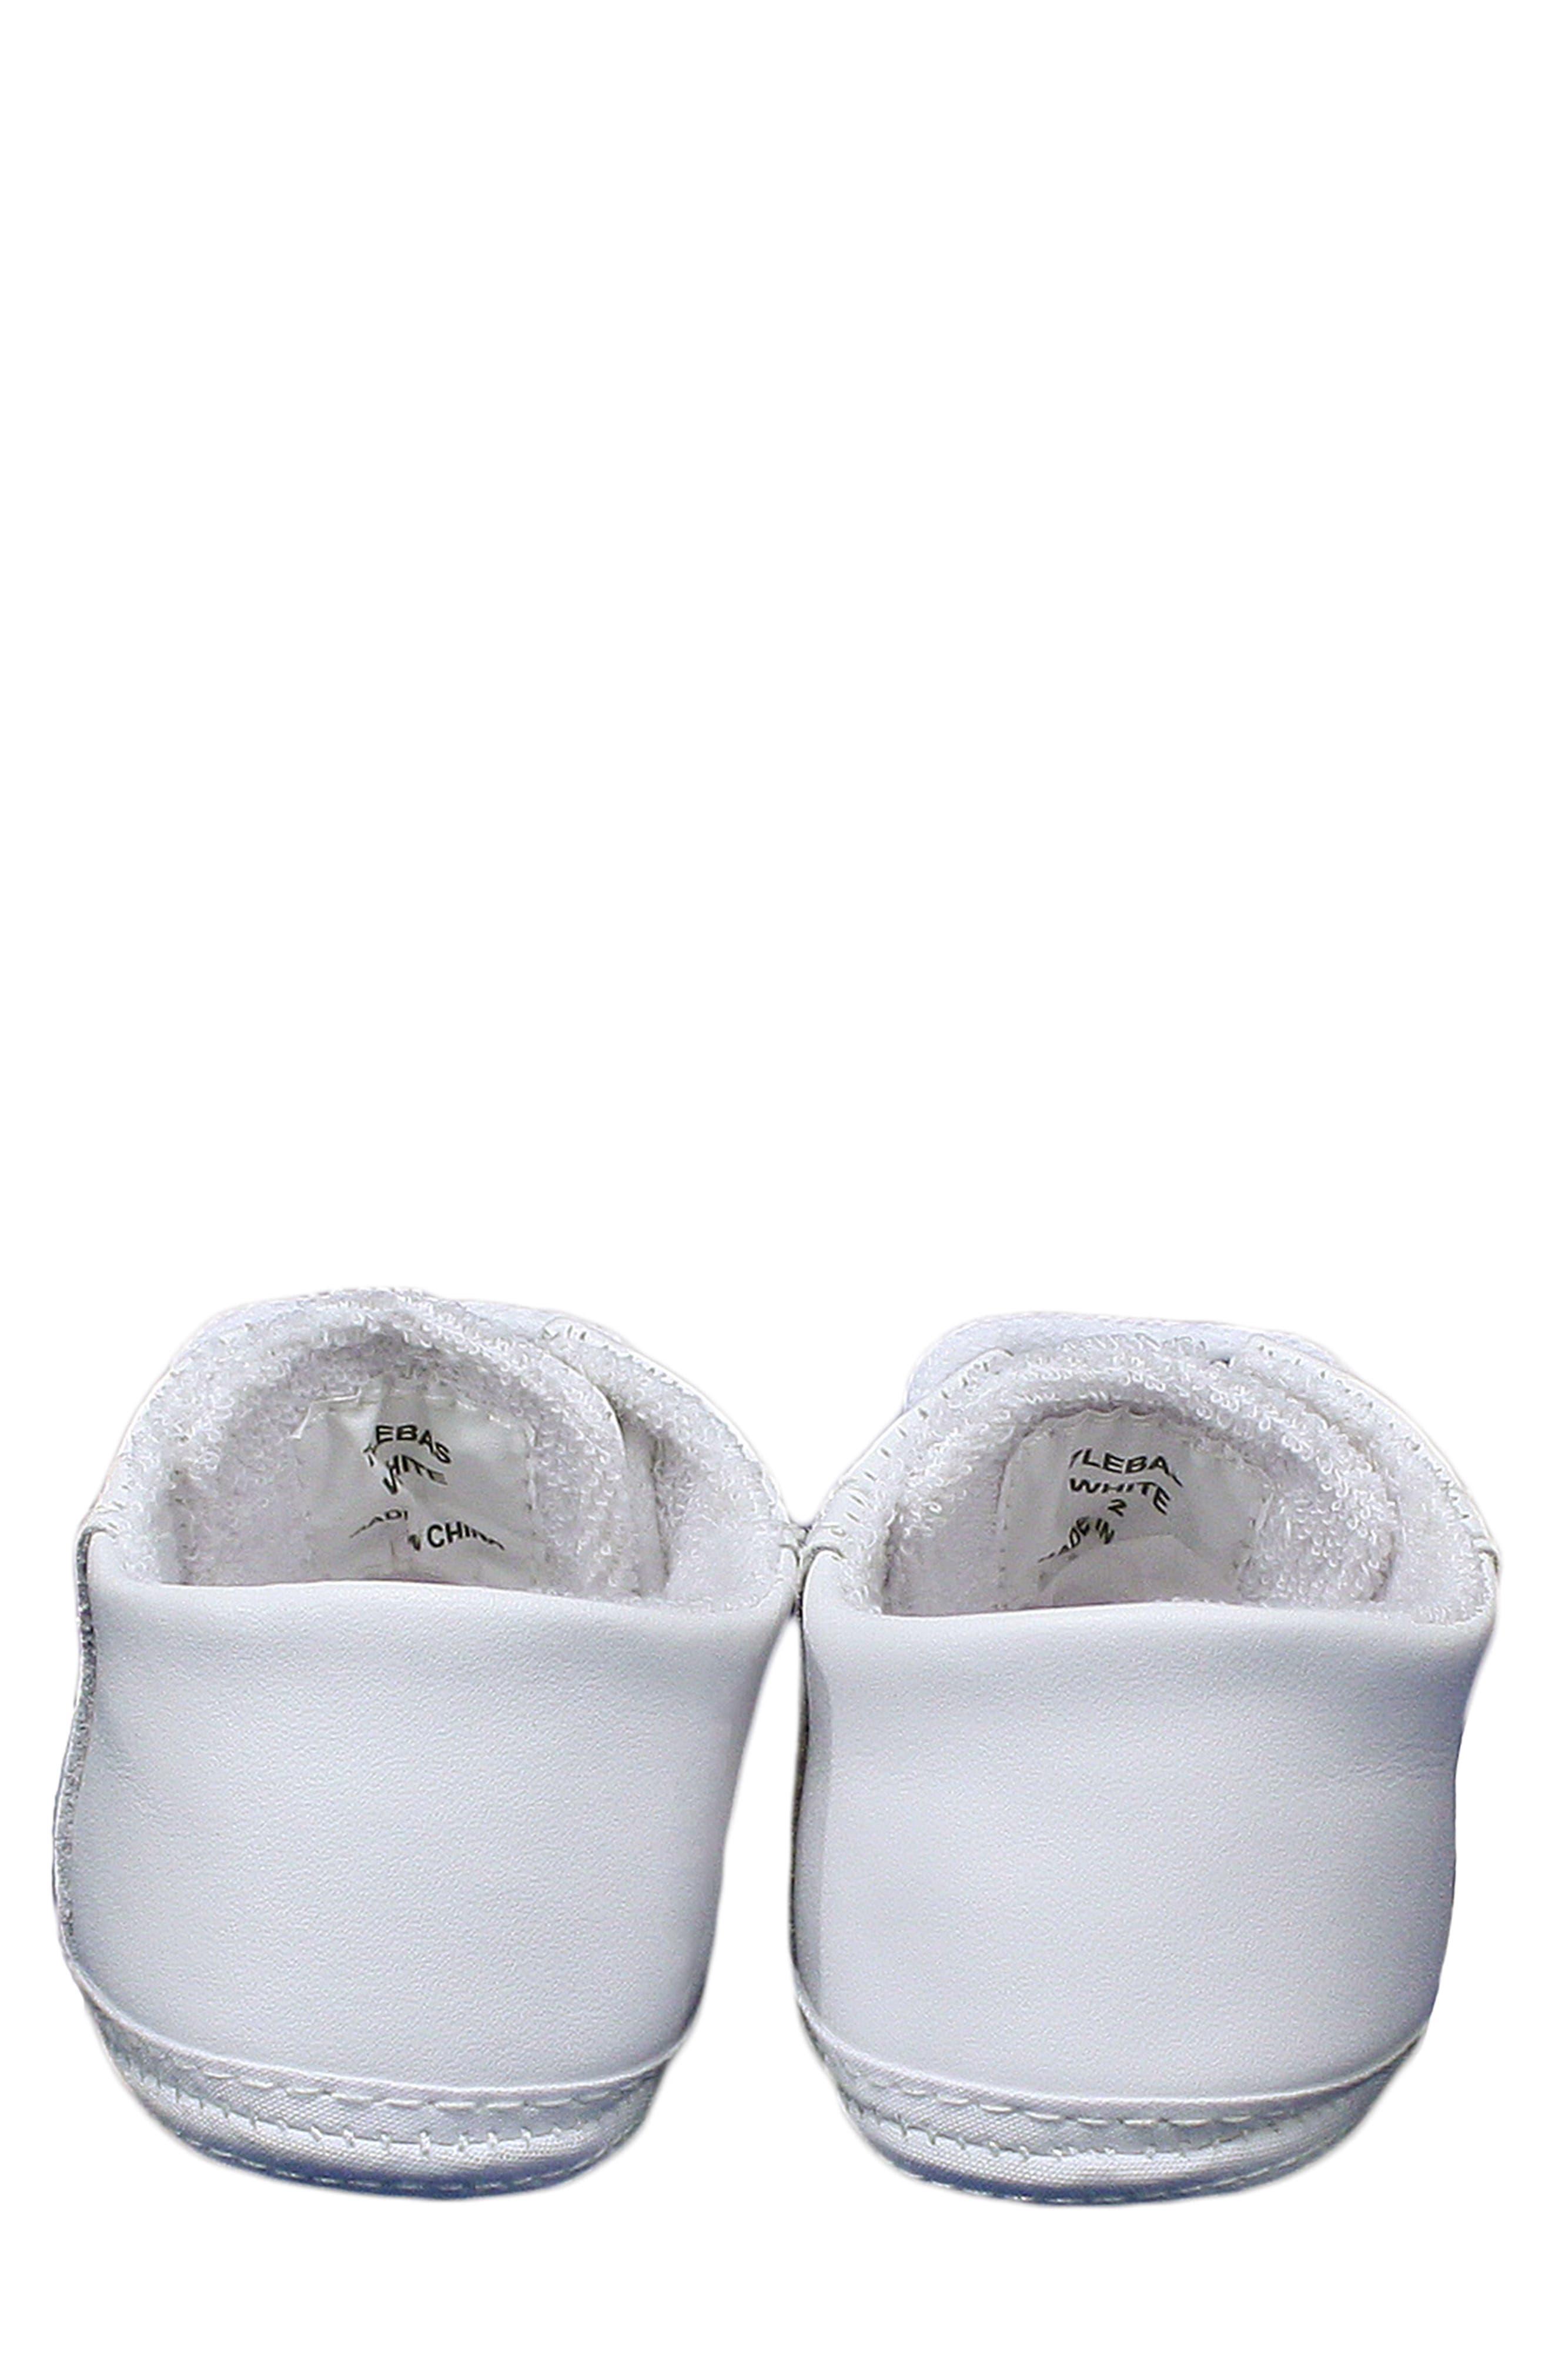 Leather Crib Shoe,                             Alternate thumbnail 3, color,                             White